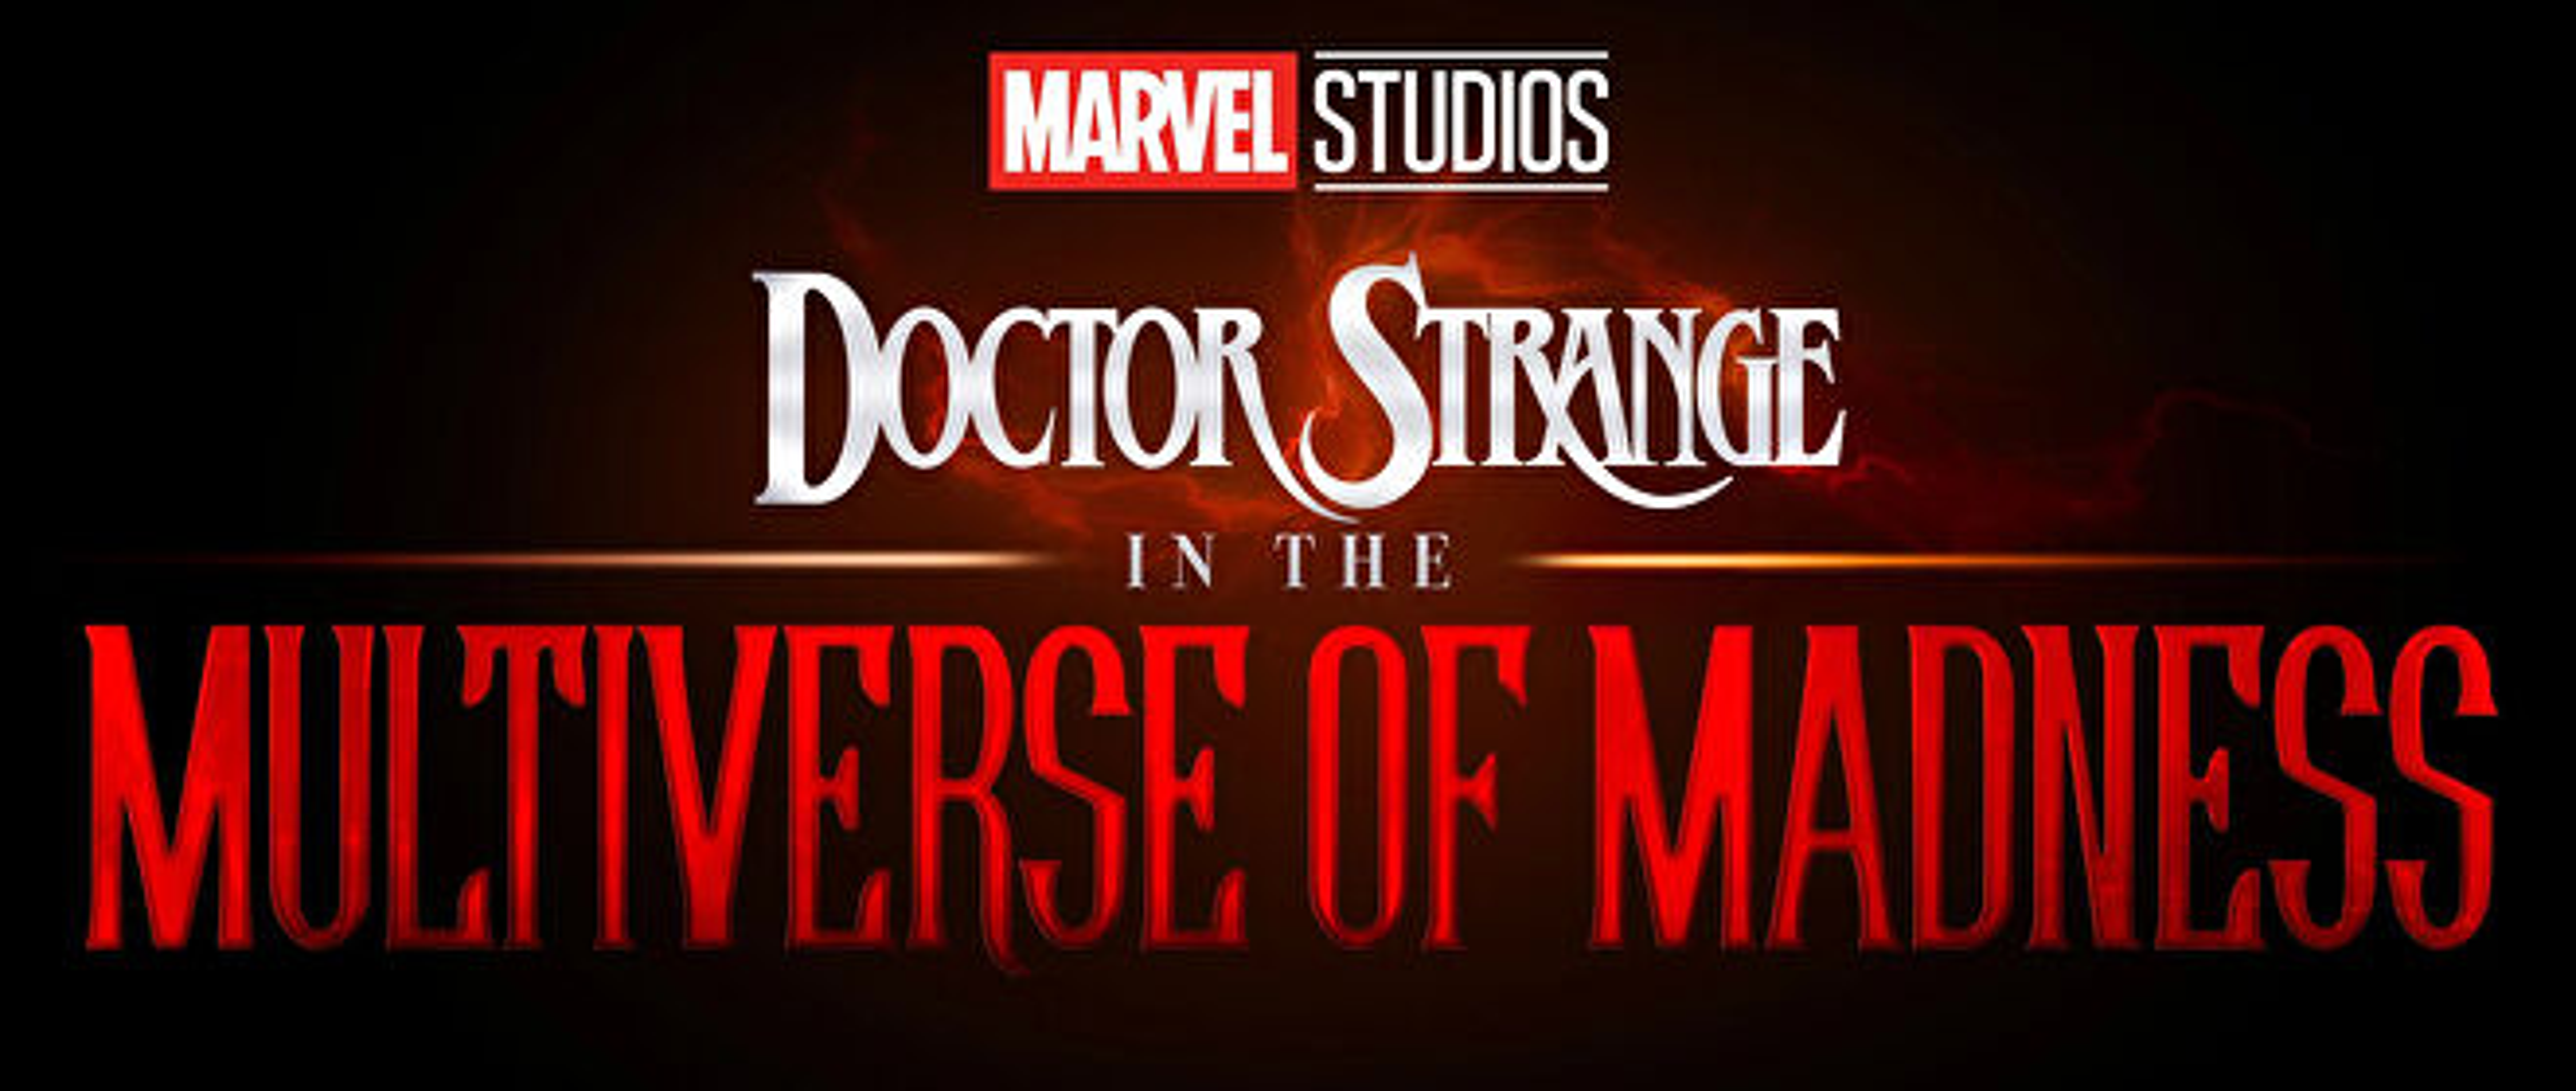 doctor-strange-multiverse-of-madness.jpg